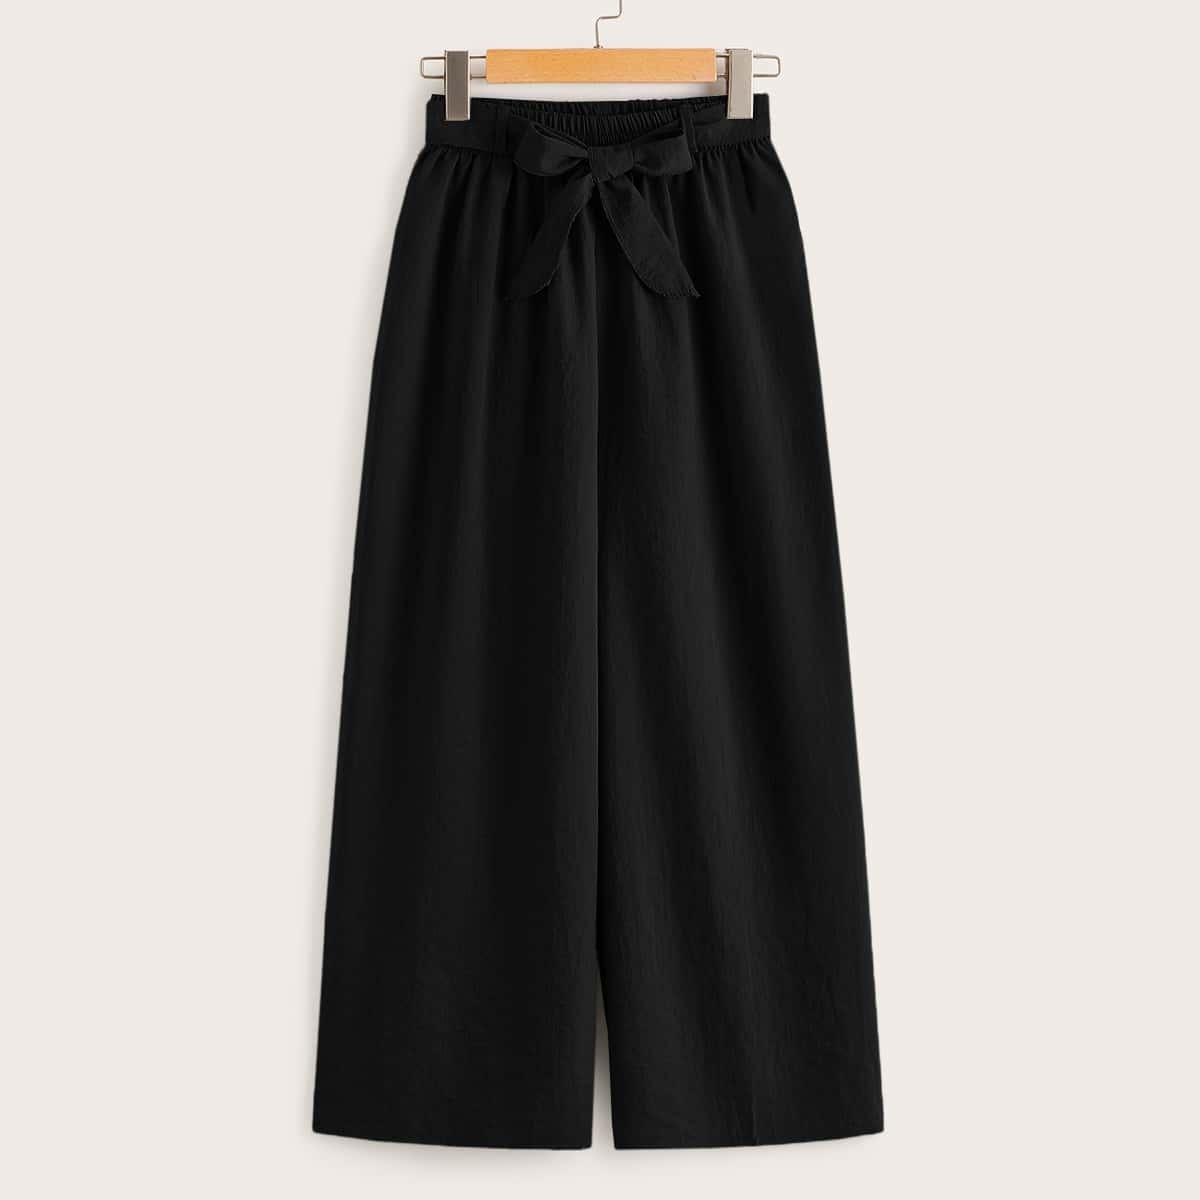 Wide Leg Waist Tie Pants